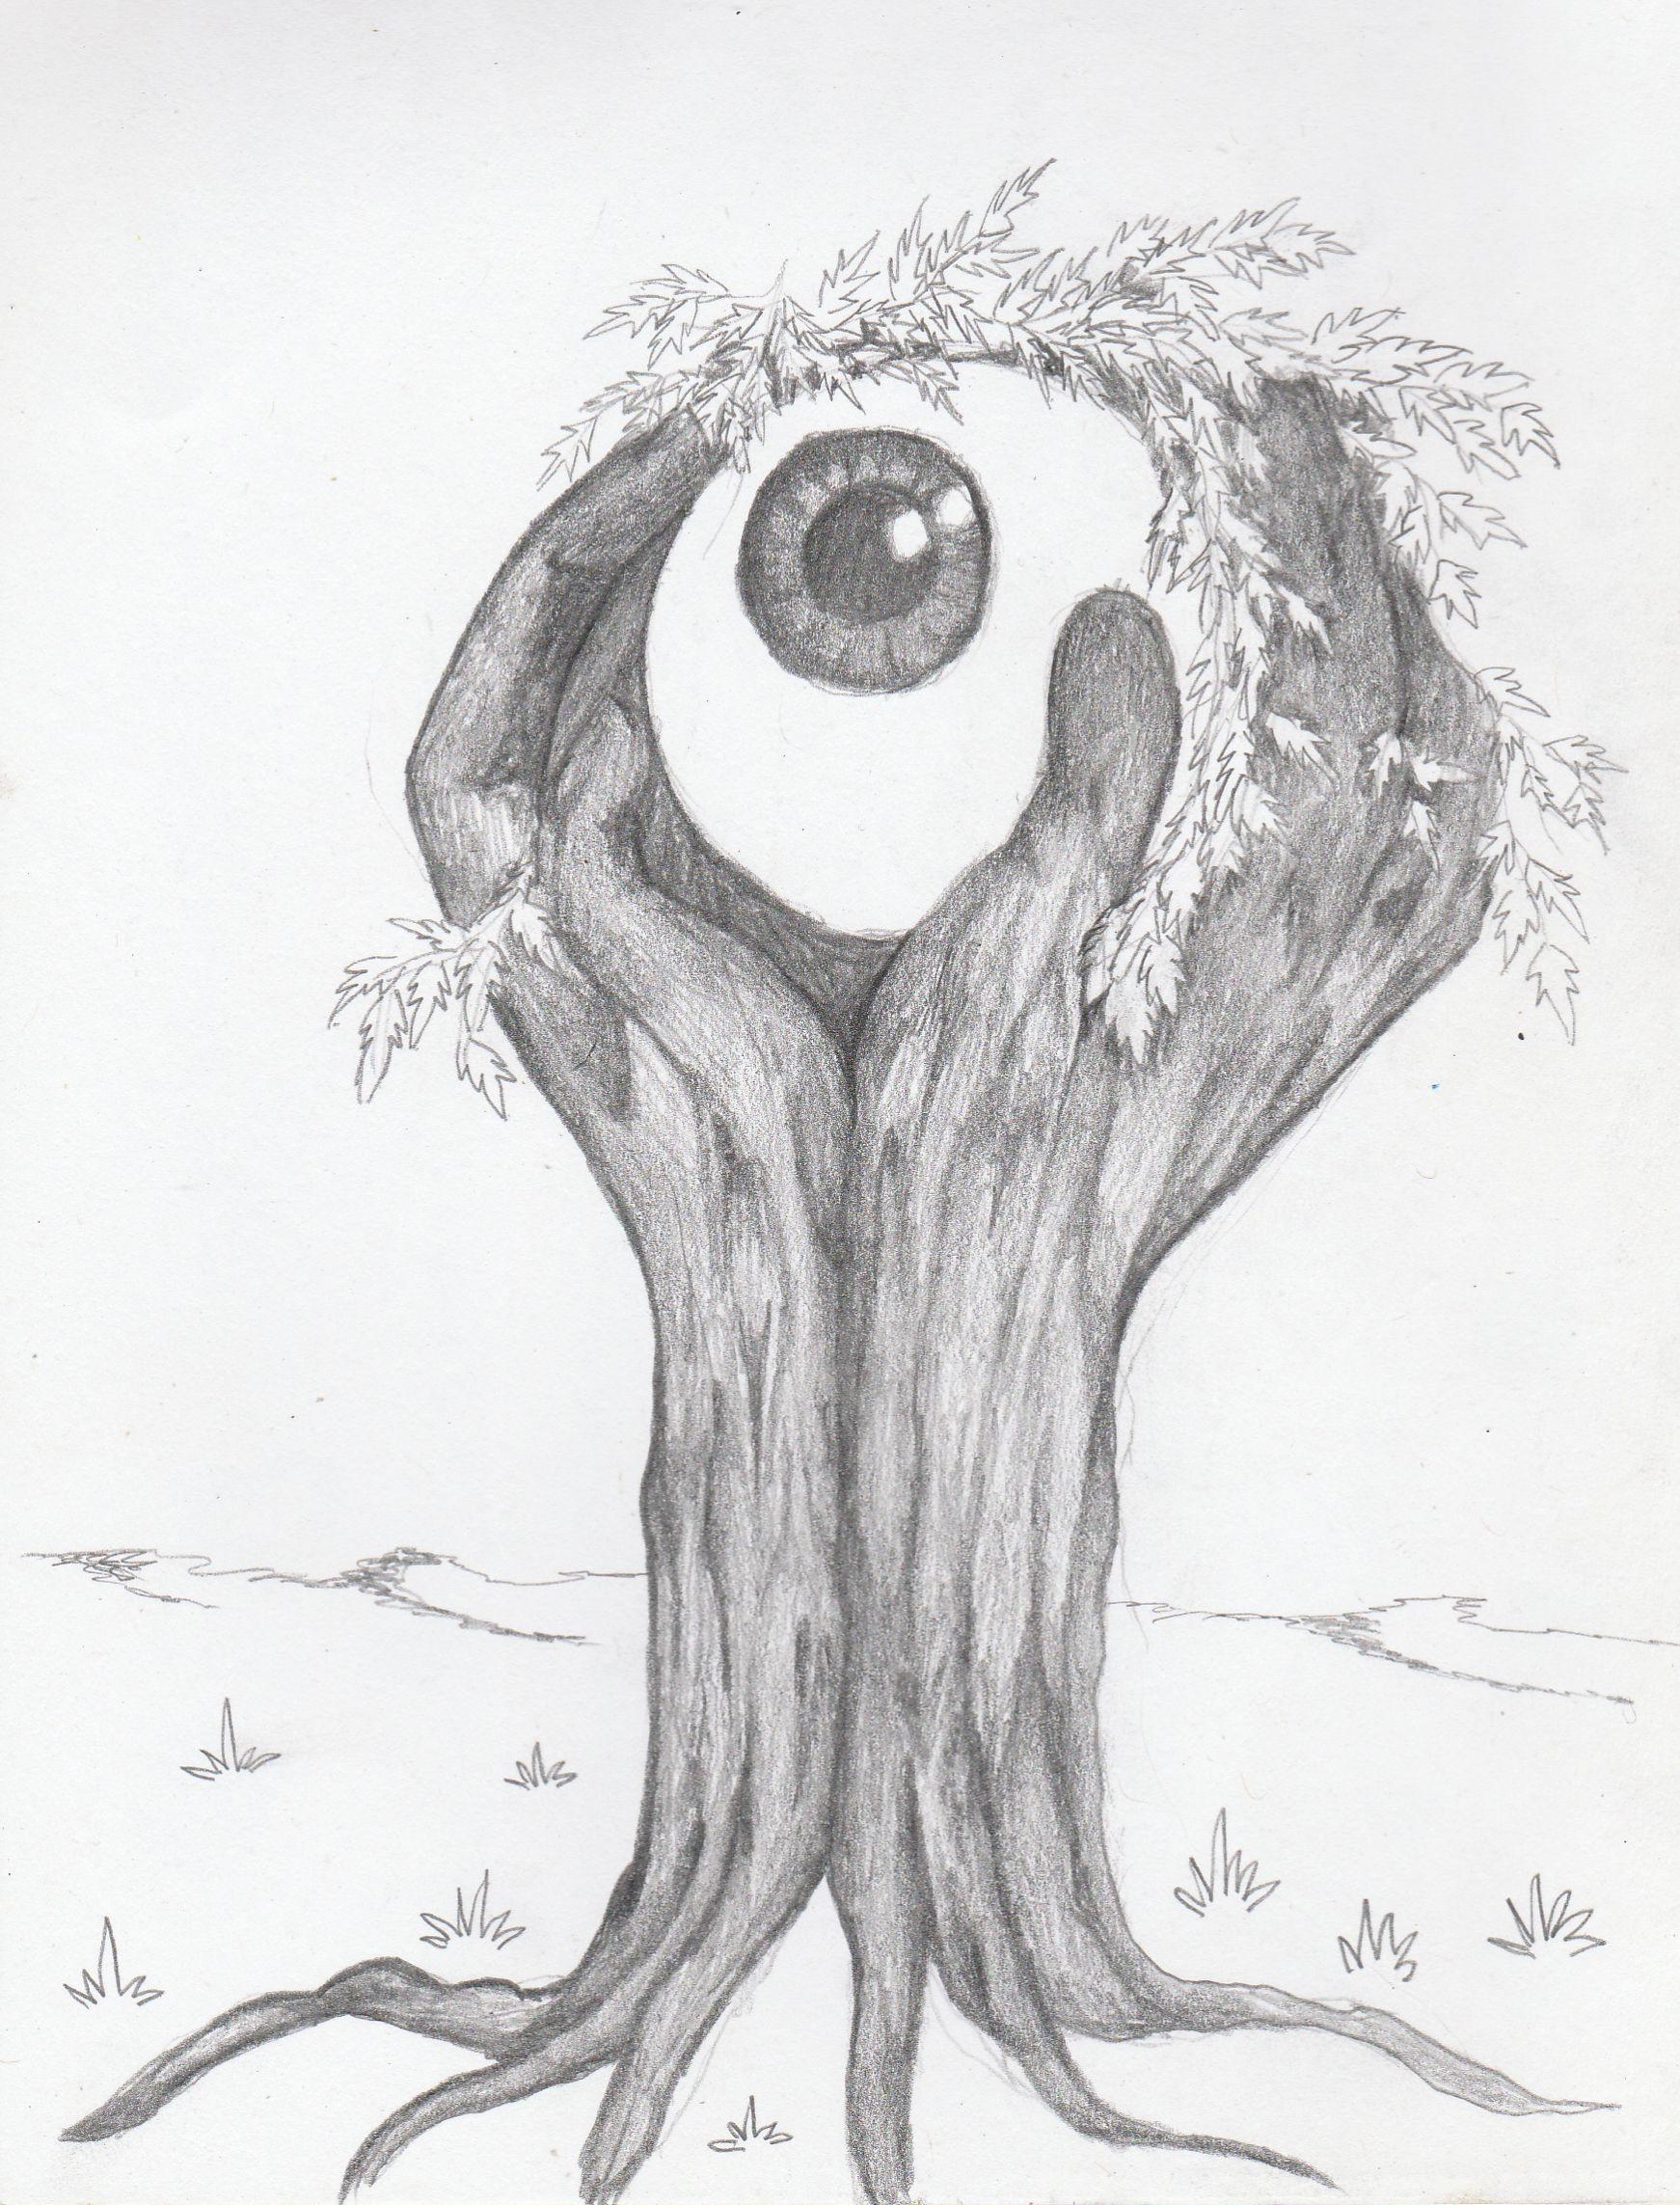 freeuse download Tree hand eye ball. Surrealism drawing.